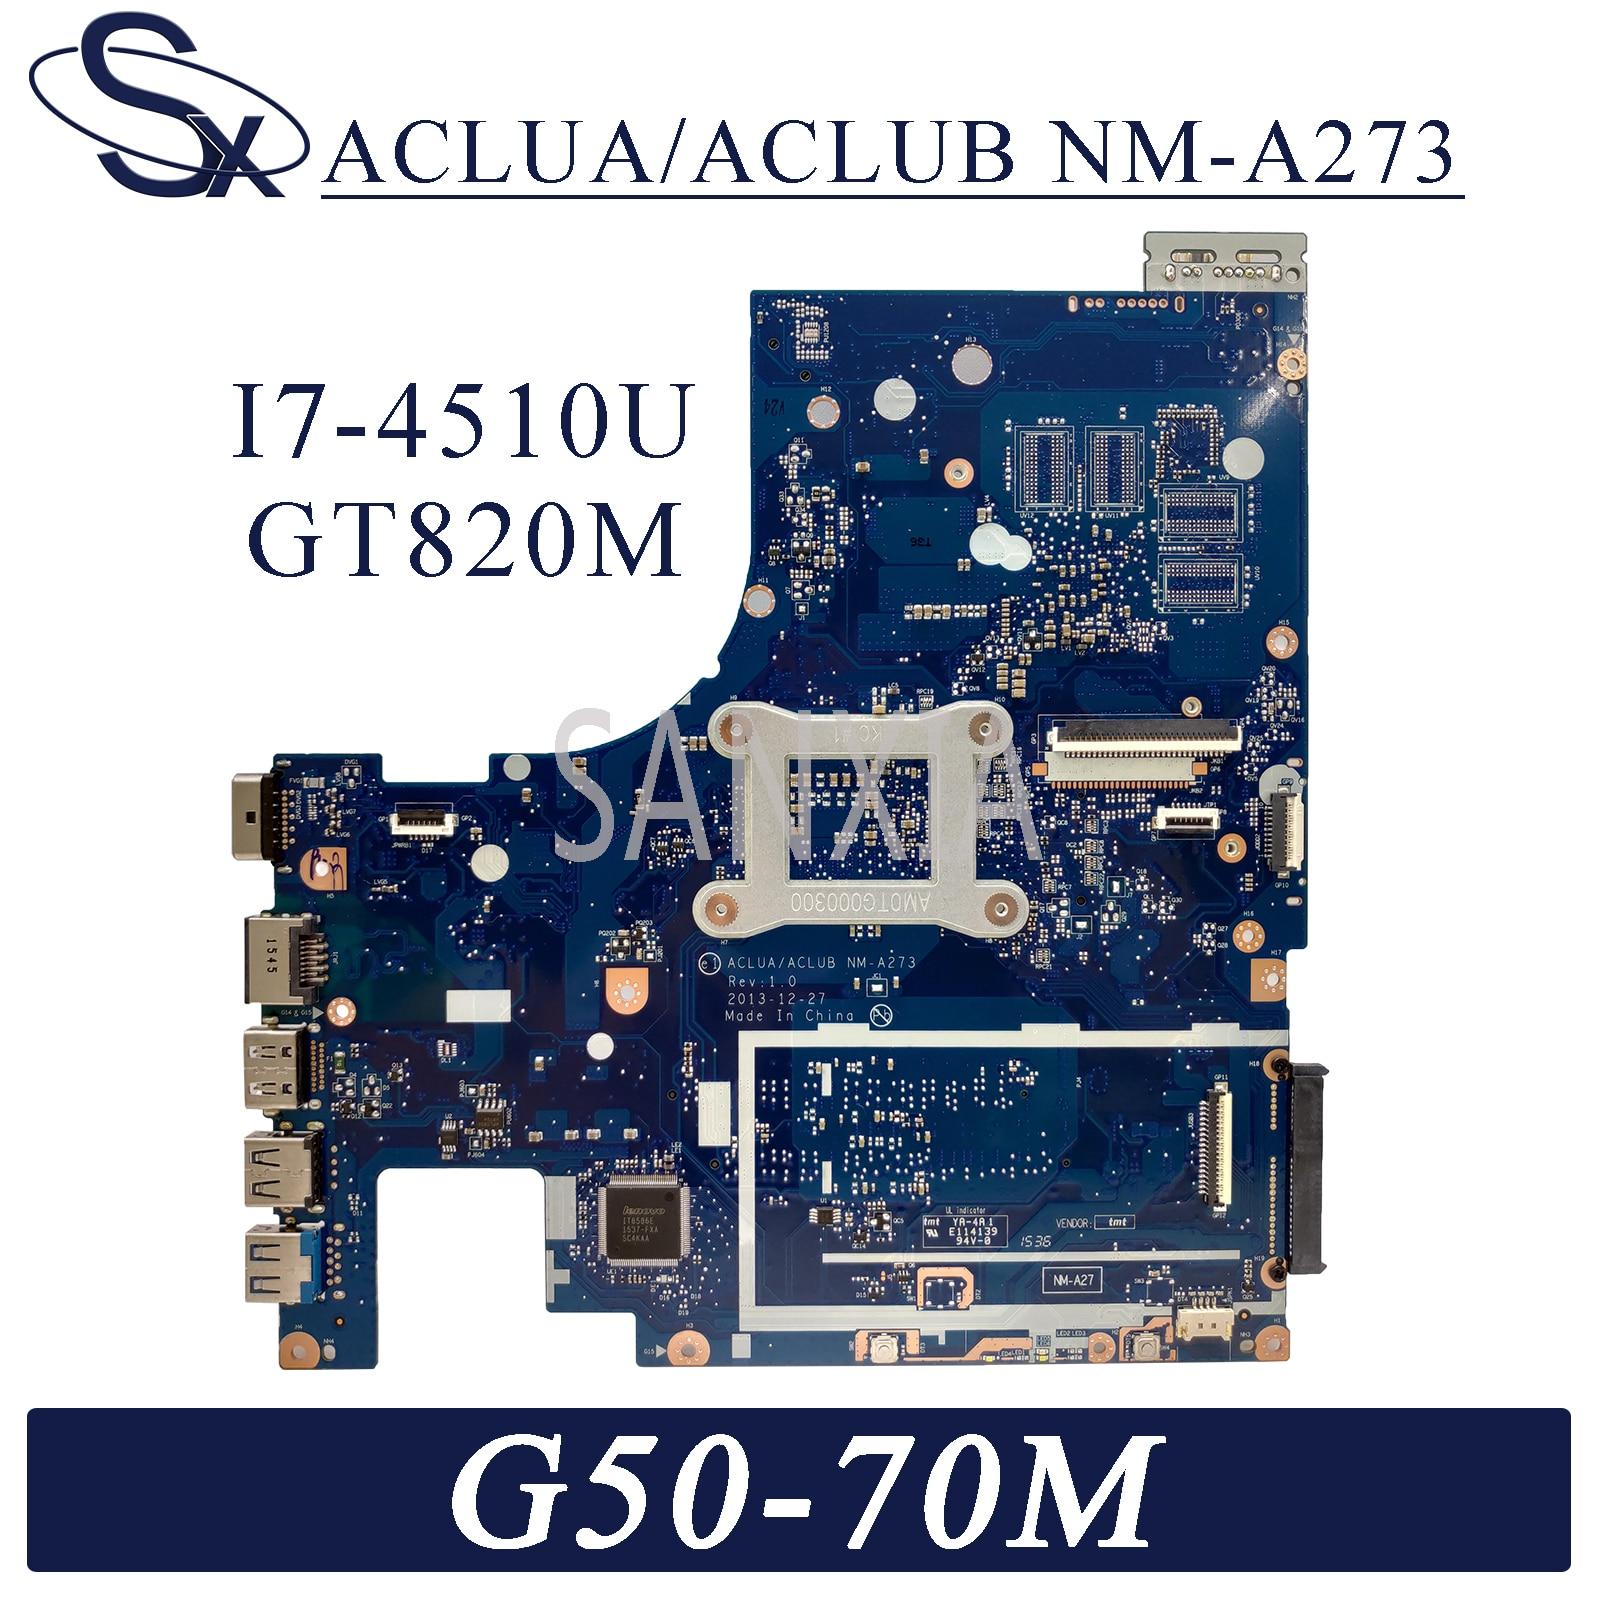 KEFU NM-A273 اللوحة المحمول لينوفو G50-70M Z50-70 اللوحة الأصلية I7-4510U GT820M